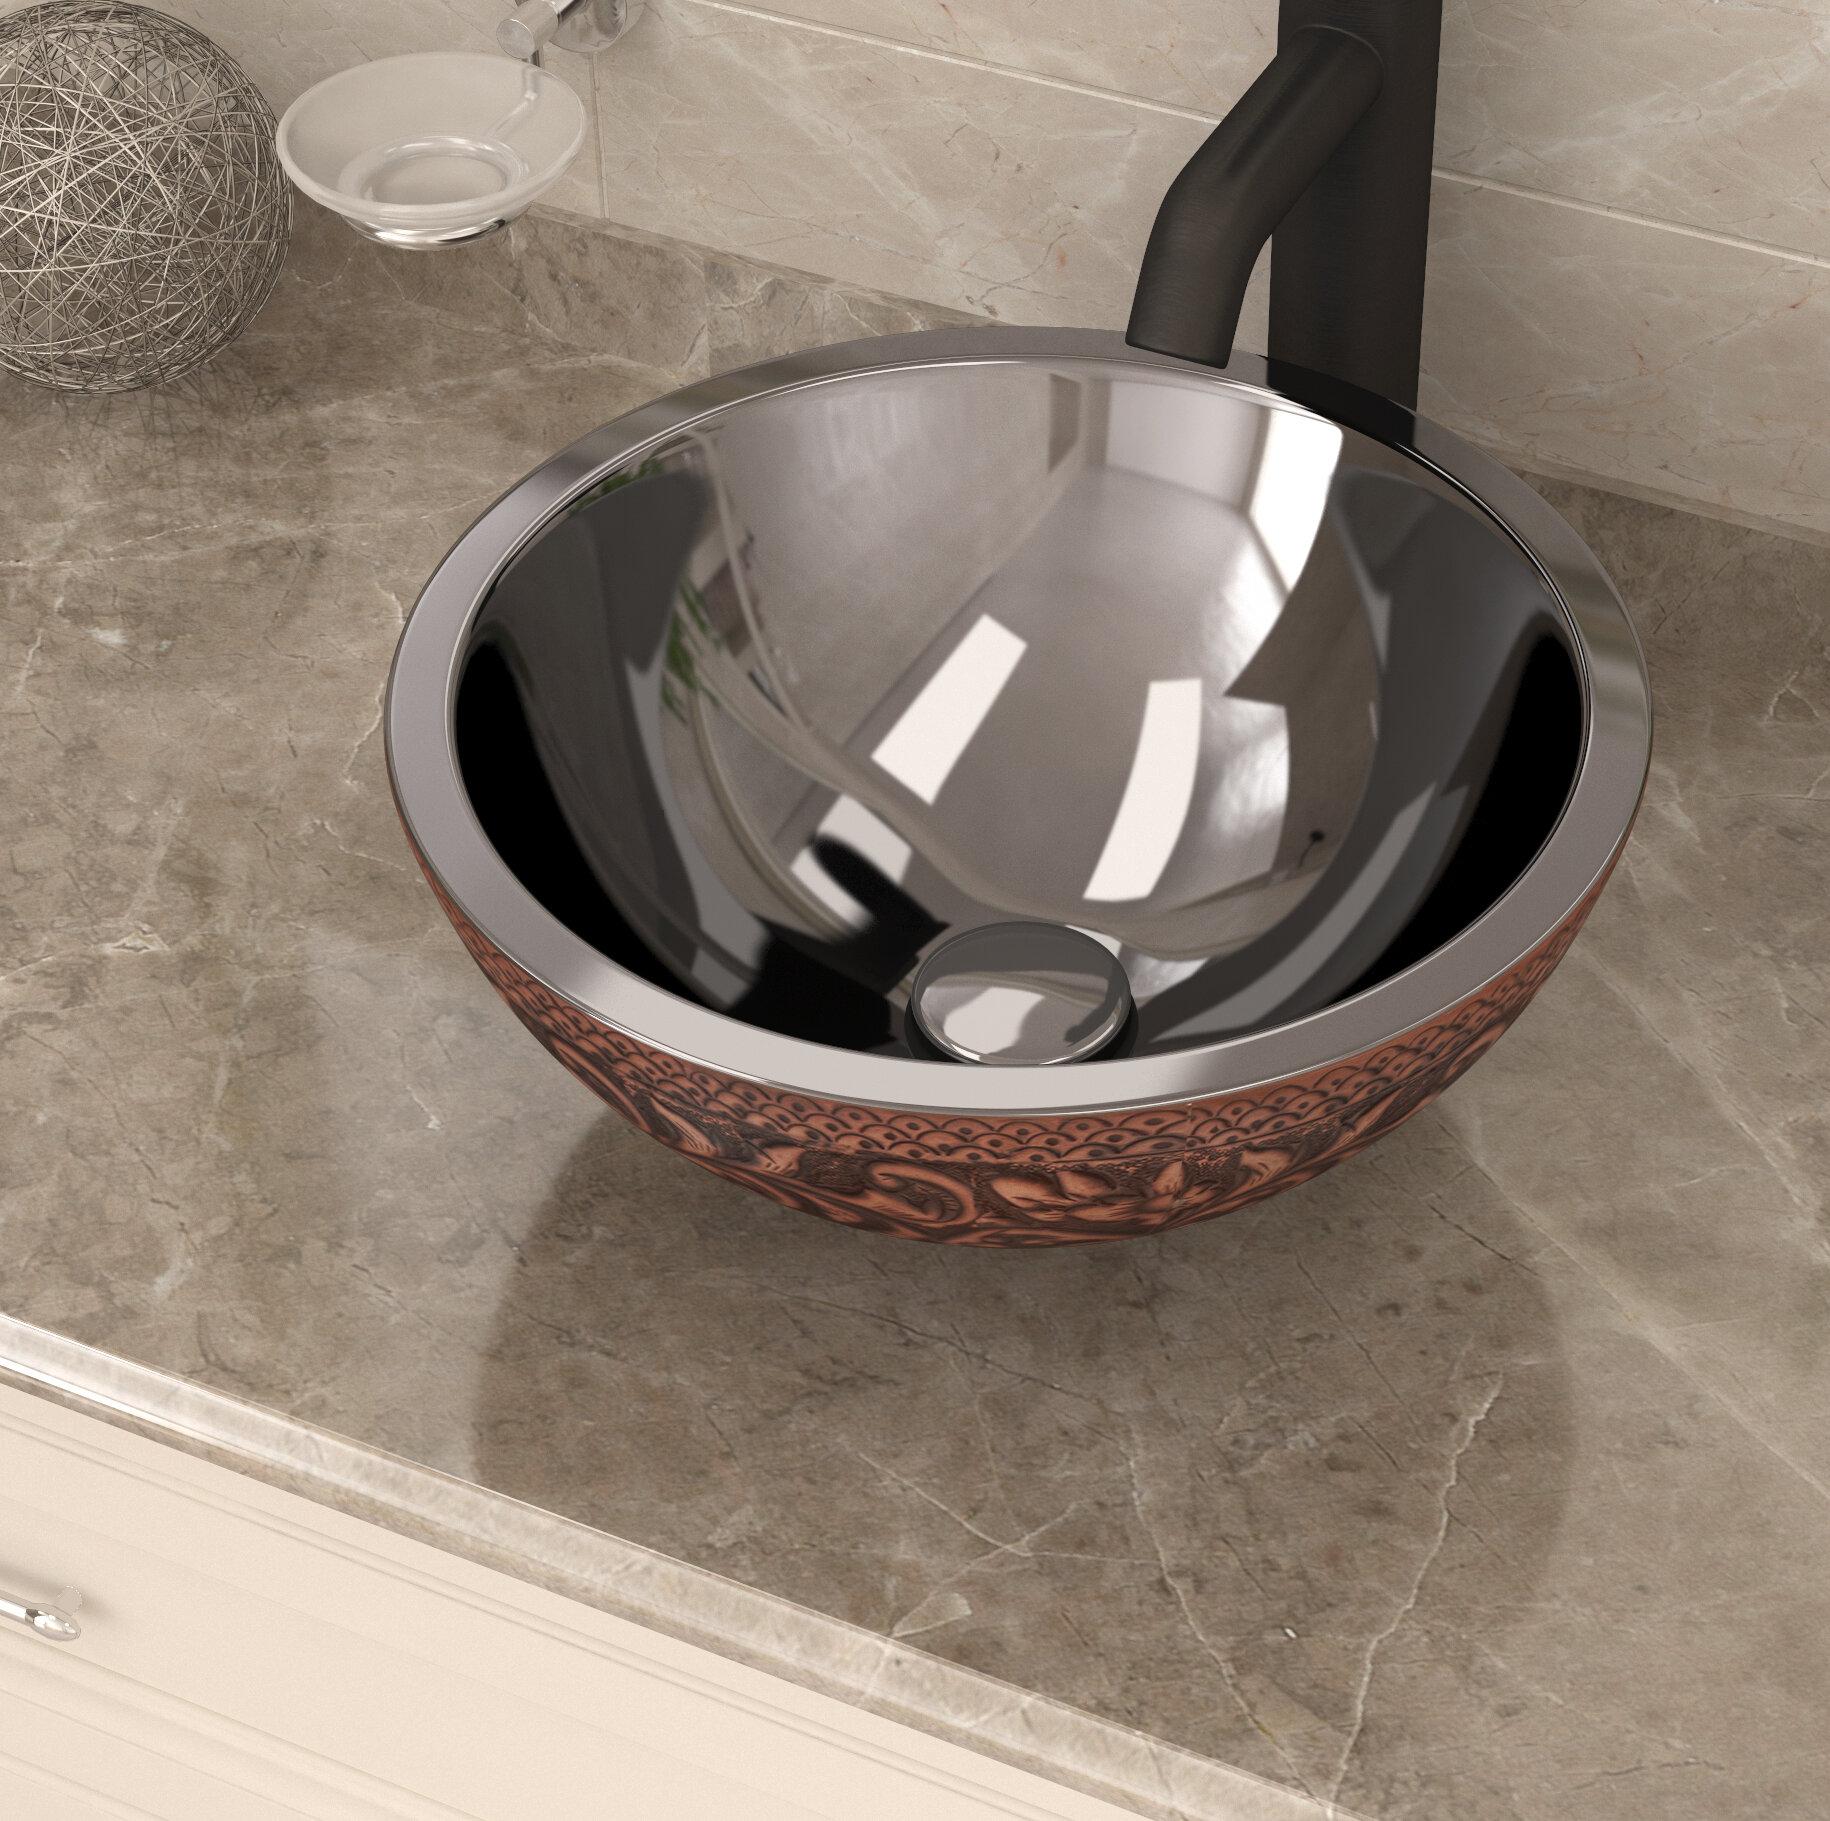 Anzzi Crete Polished Antique Copper Copper Handmade Circular Vessel Bathroom Sink Wayfair